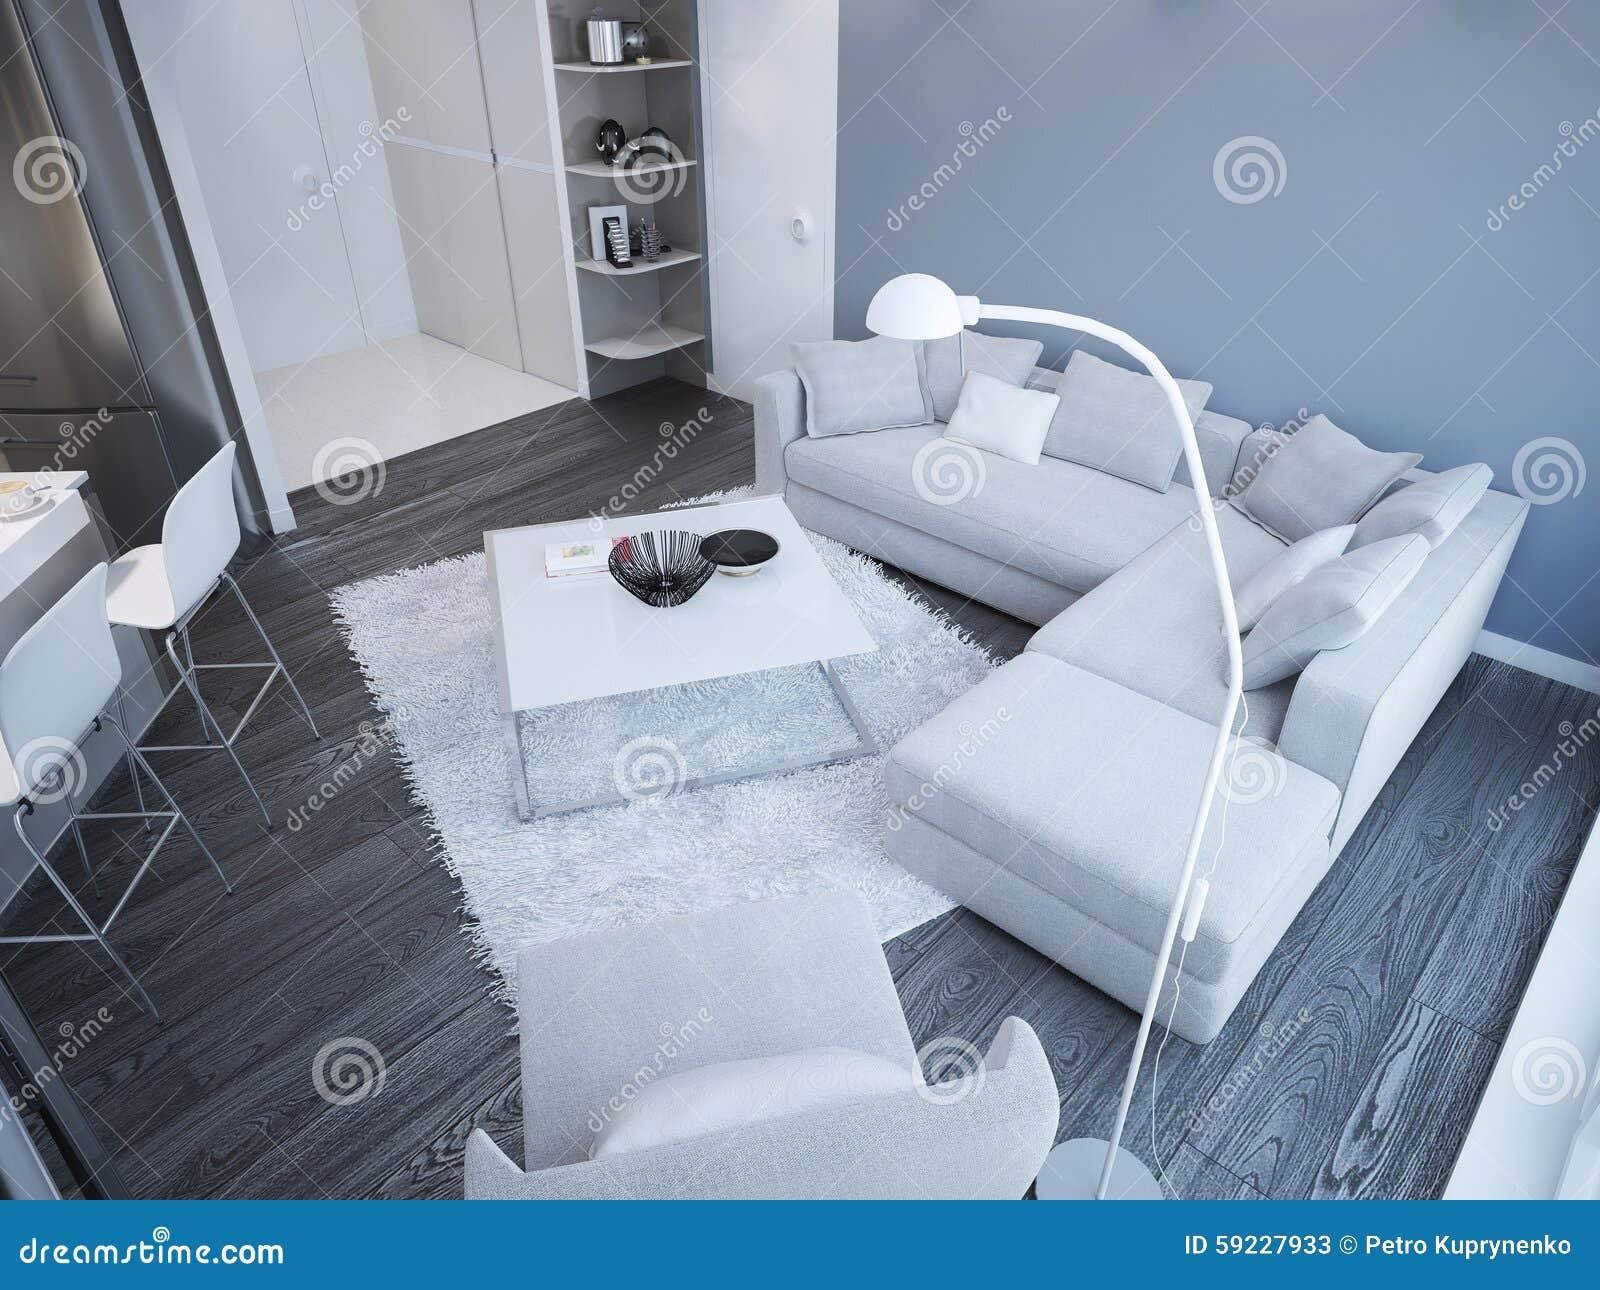 Idea del estudio minimalista de la sala de estar